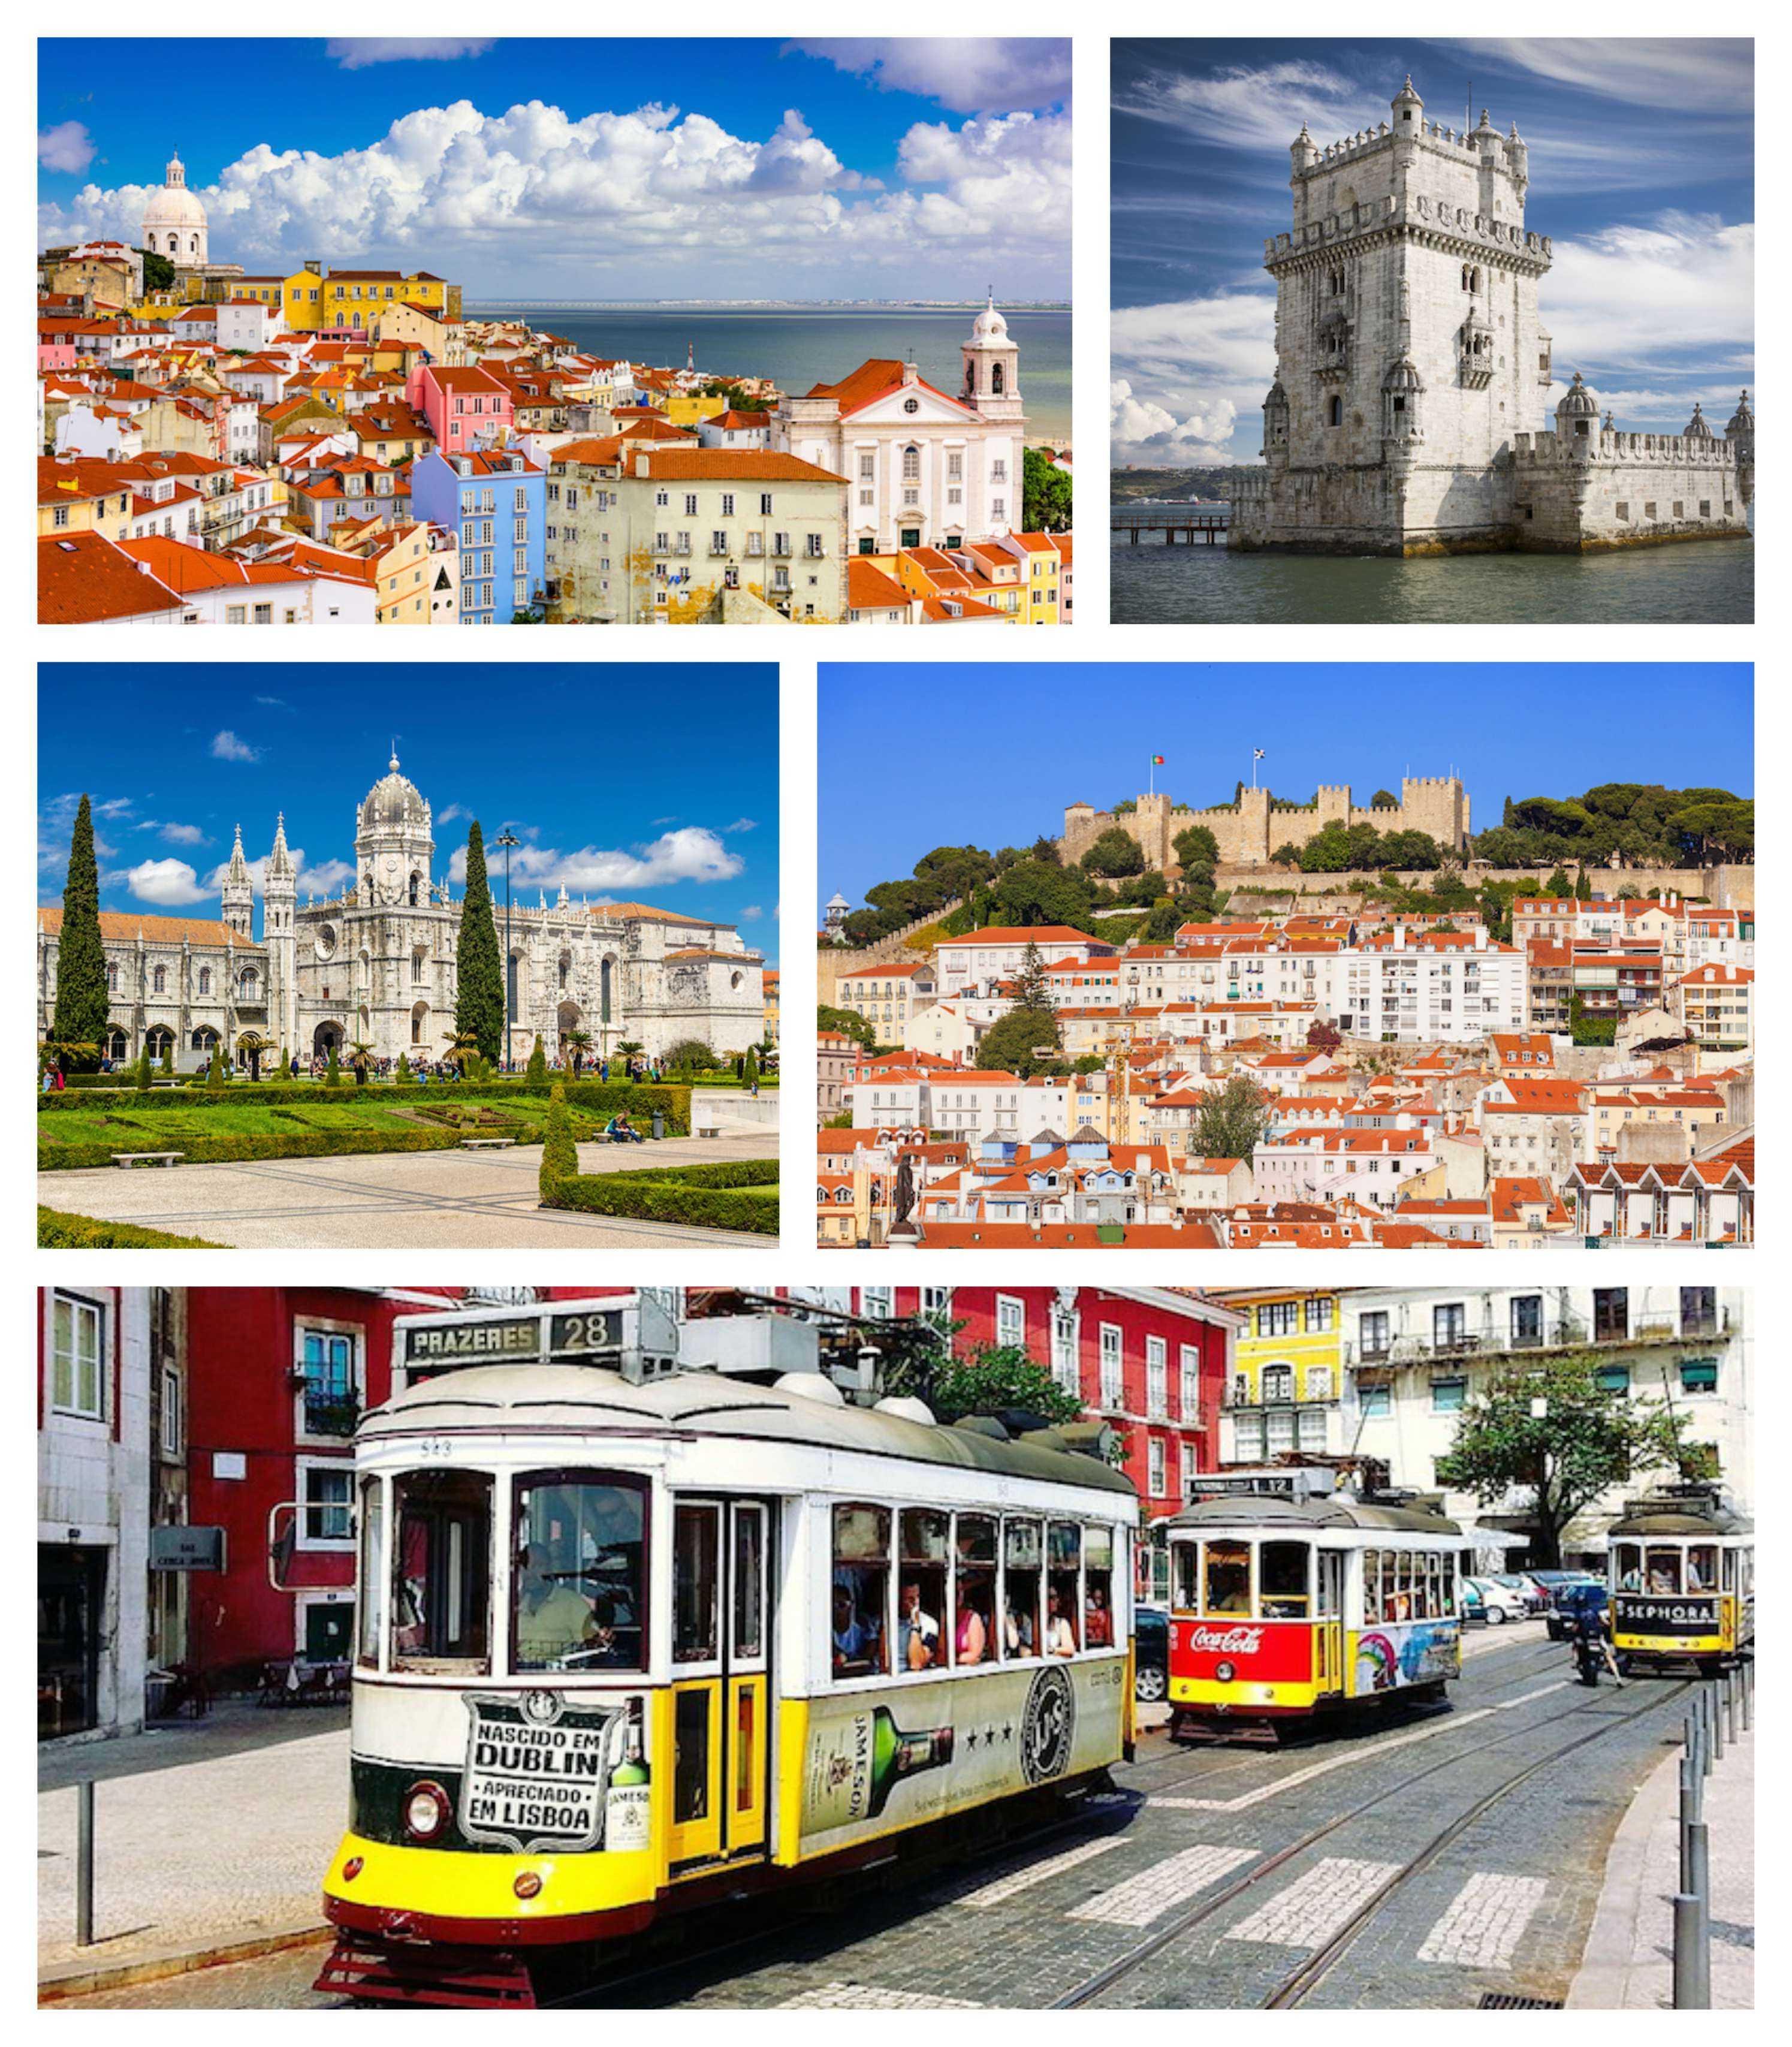 Alfama - the original Moorish district of Lisbon 57